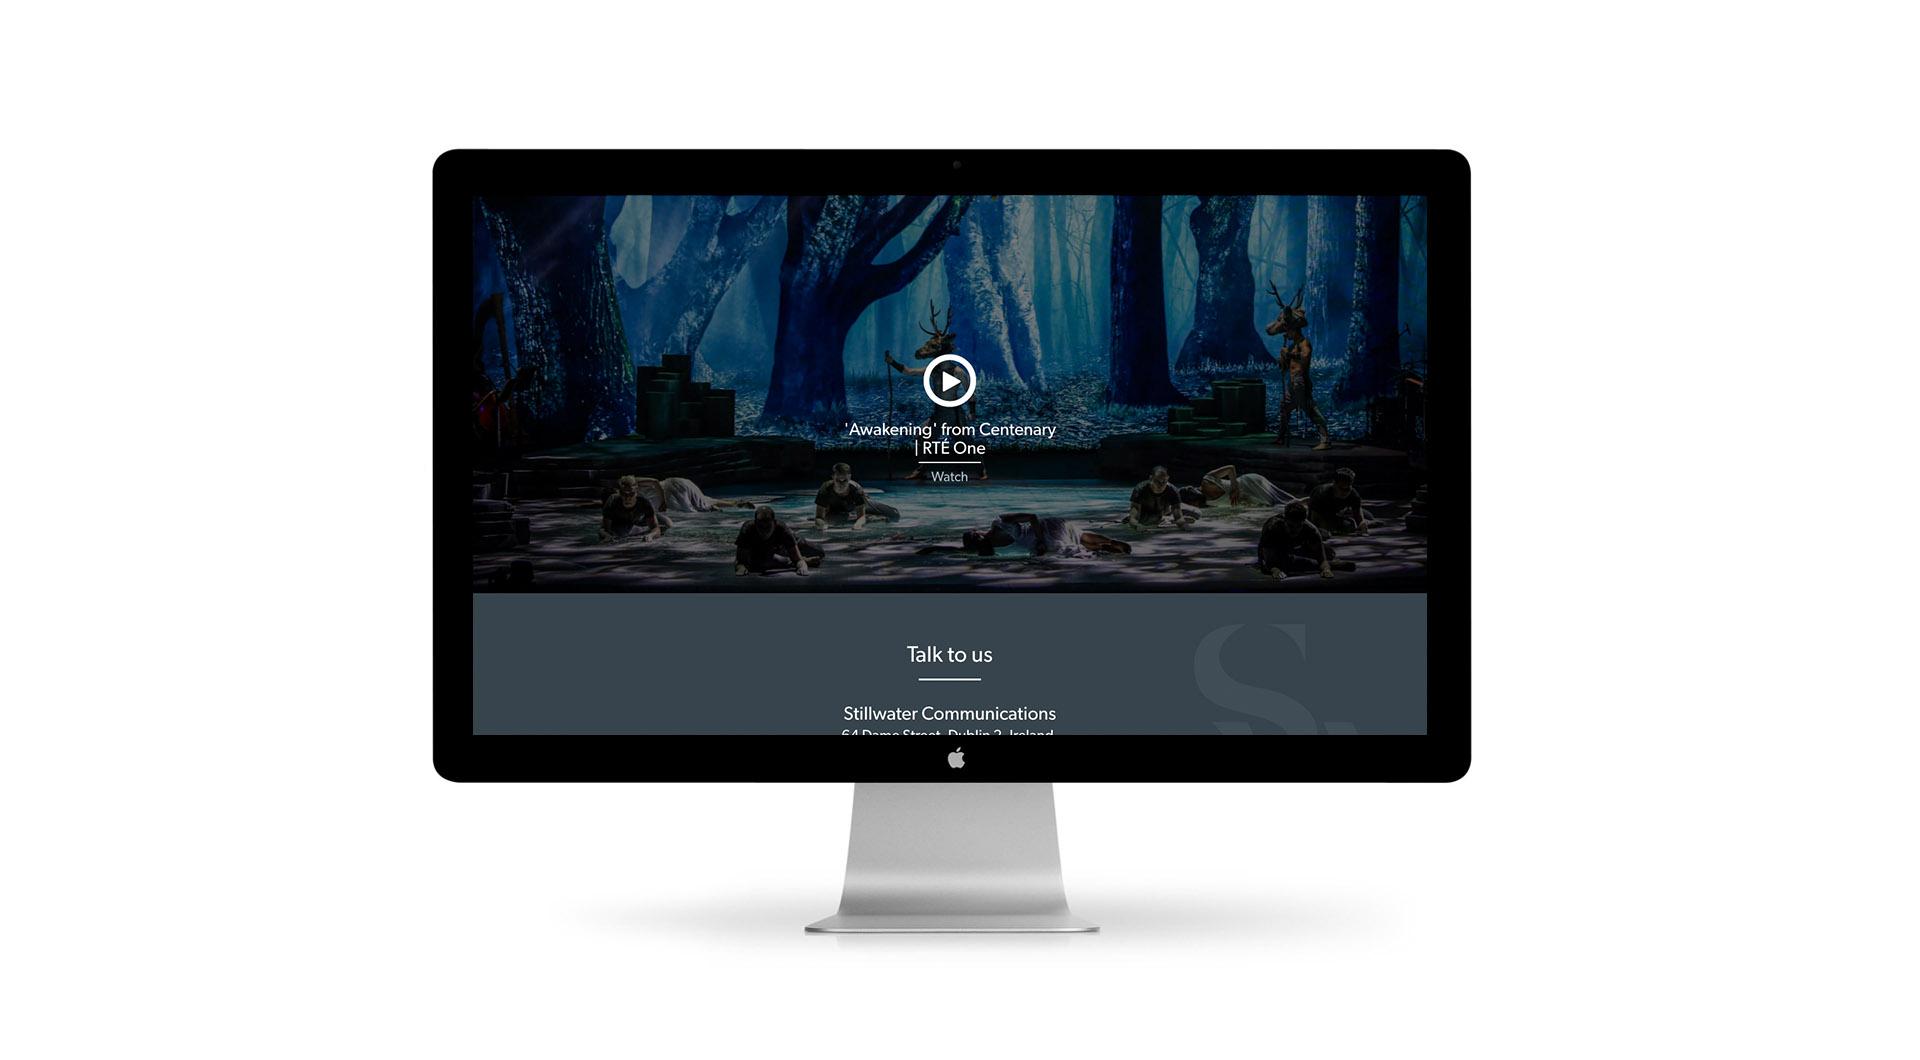 Stillwater Communications Website Design Video Layout.